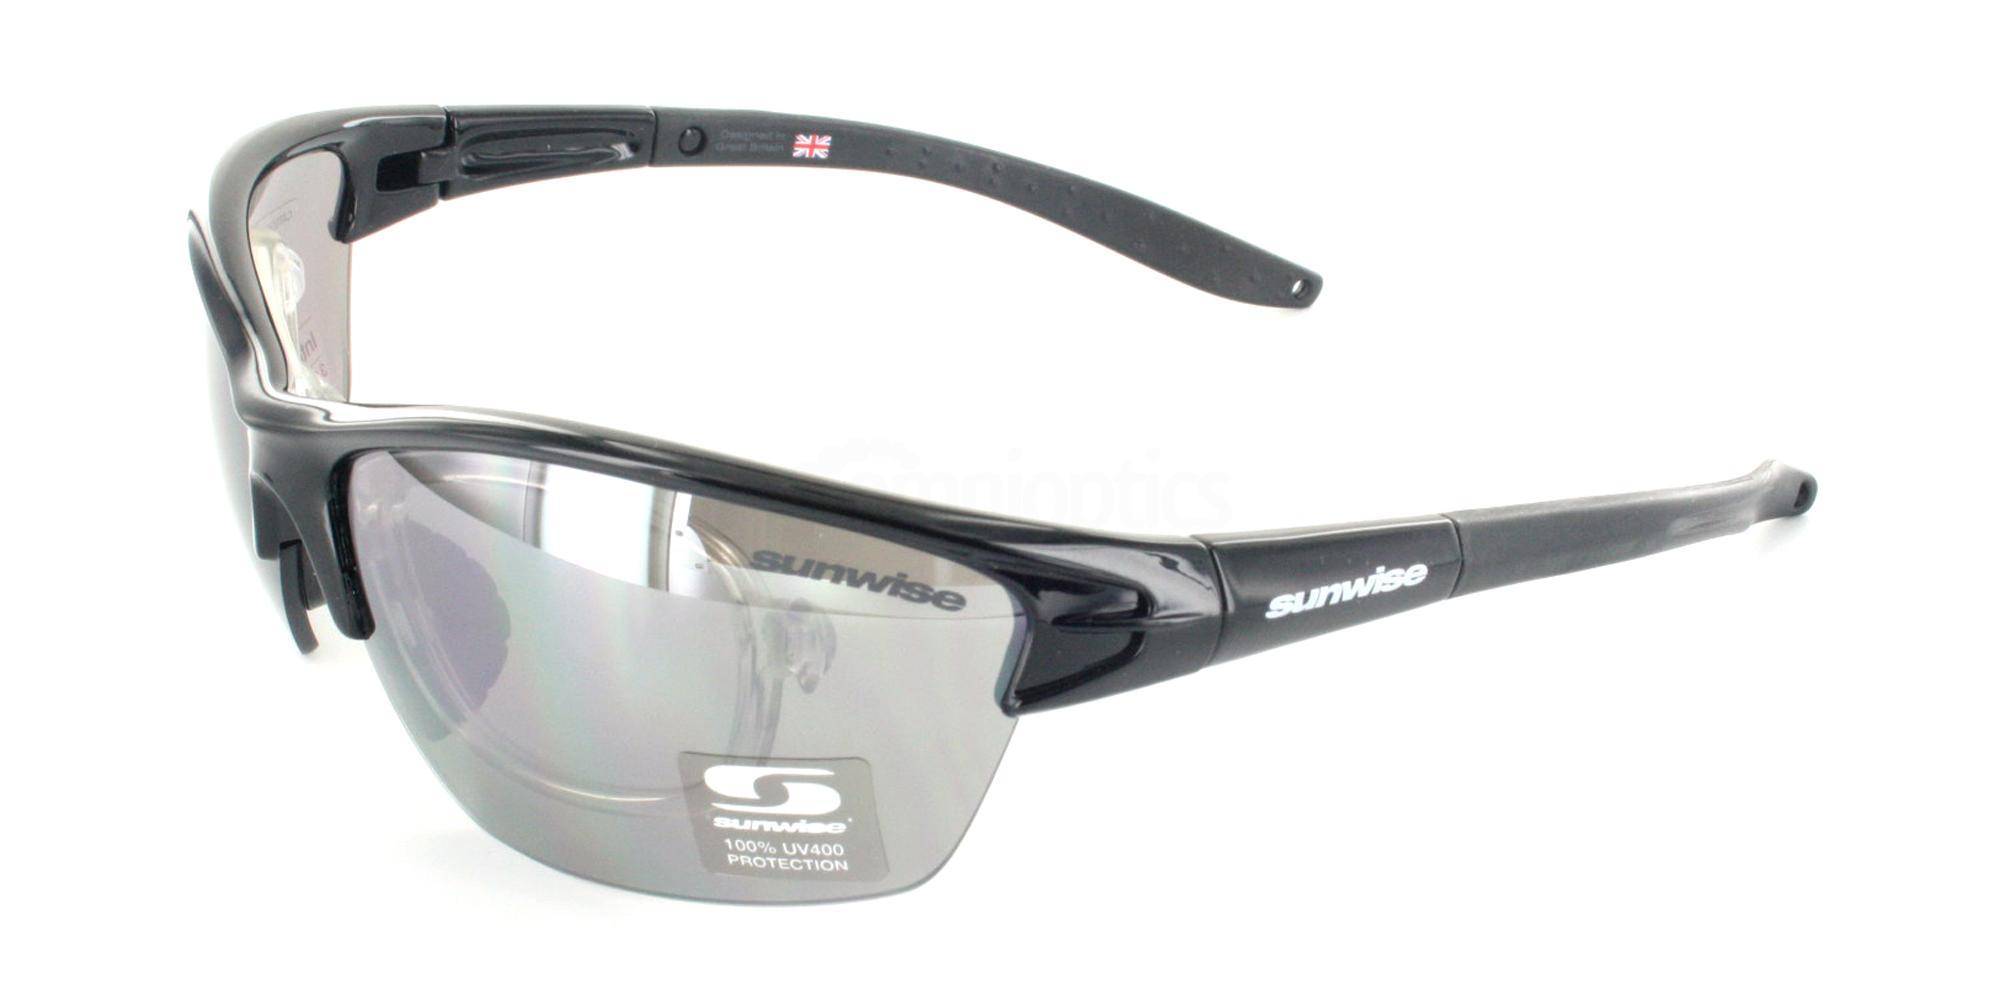 Black Montreal MK - 4 sets pc lenses Sunglasses, Sunwise